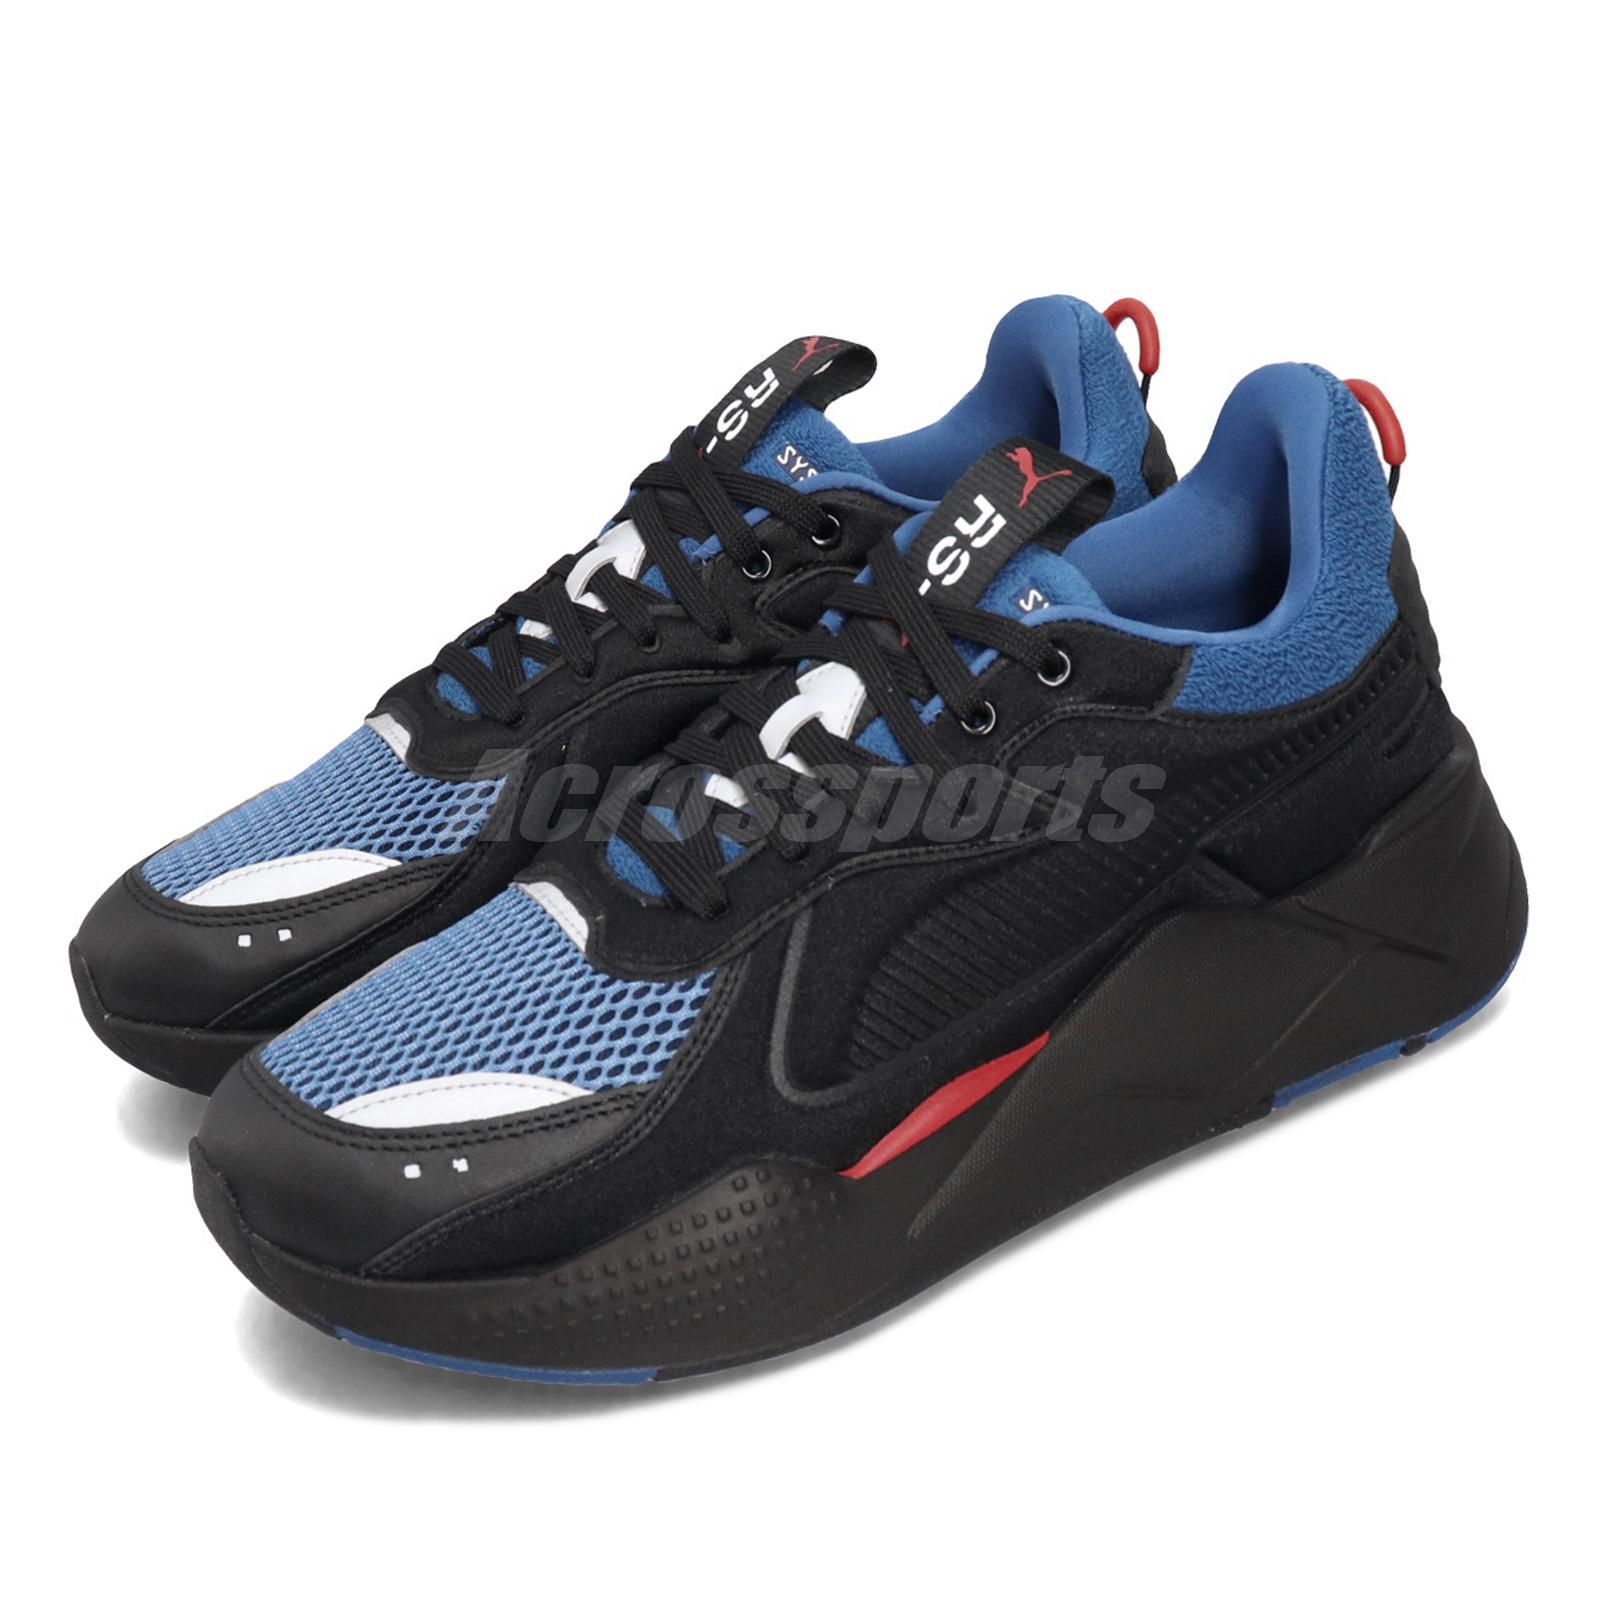 Puma Expedite Mens Running Shoes Blue | Start Fitness